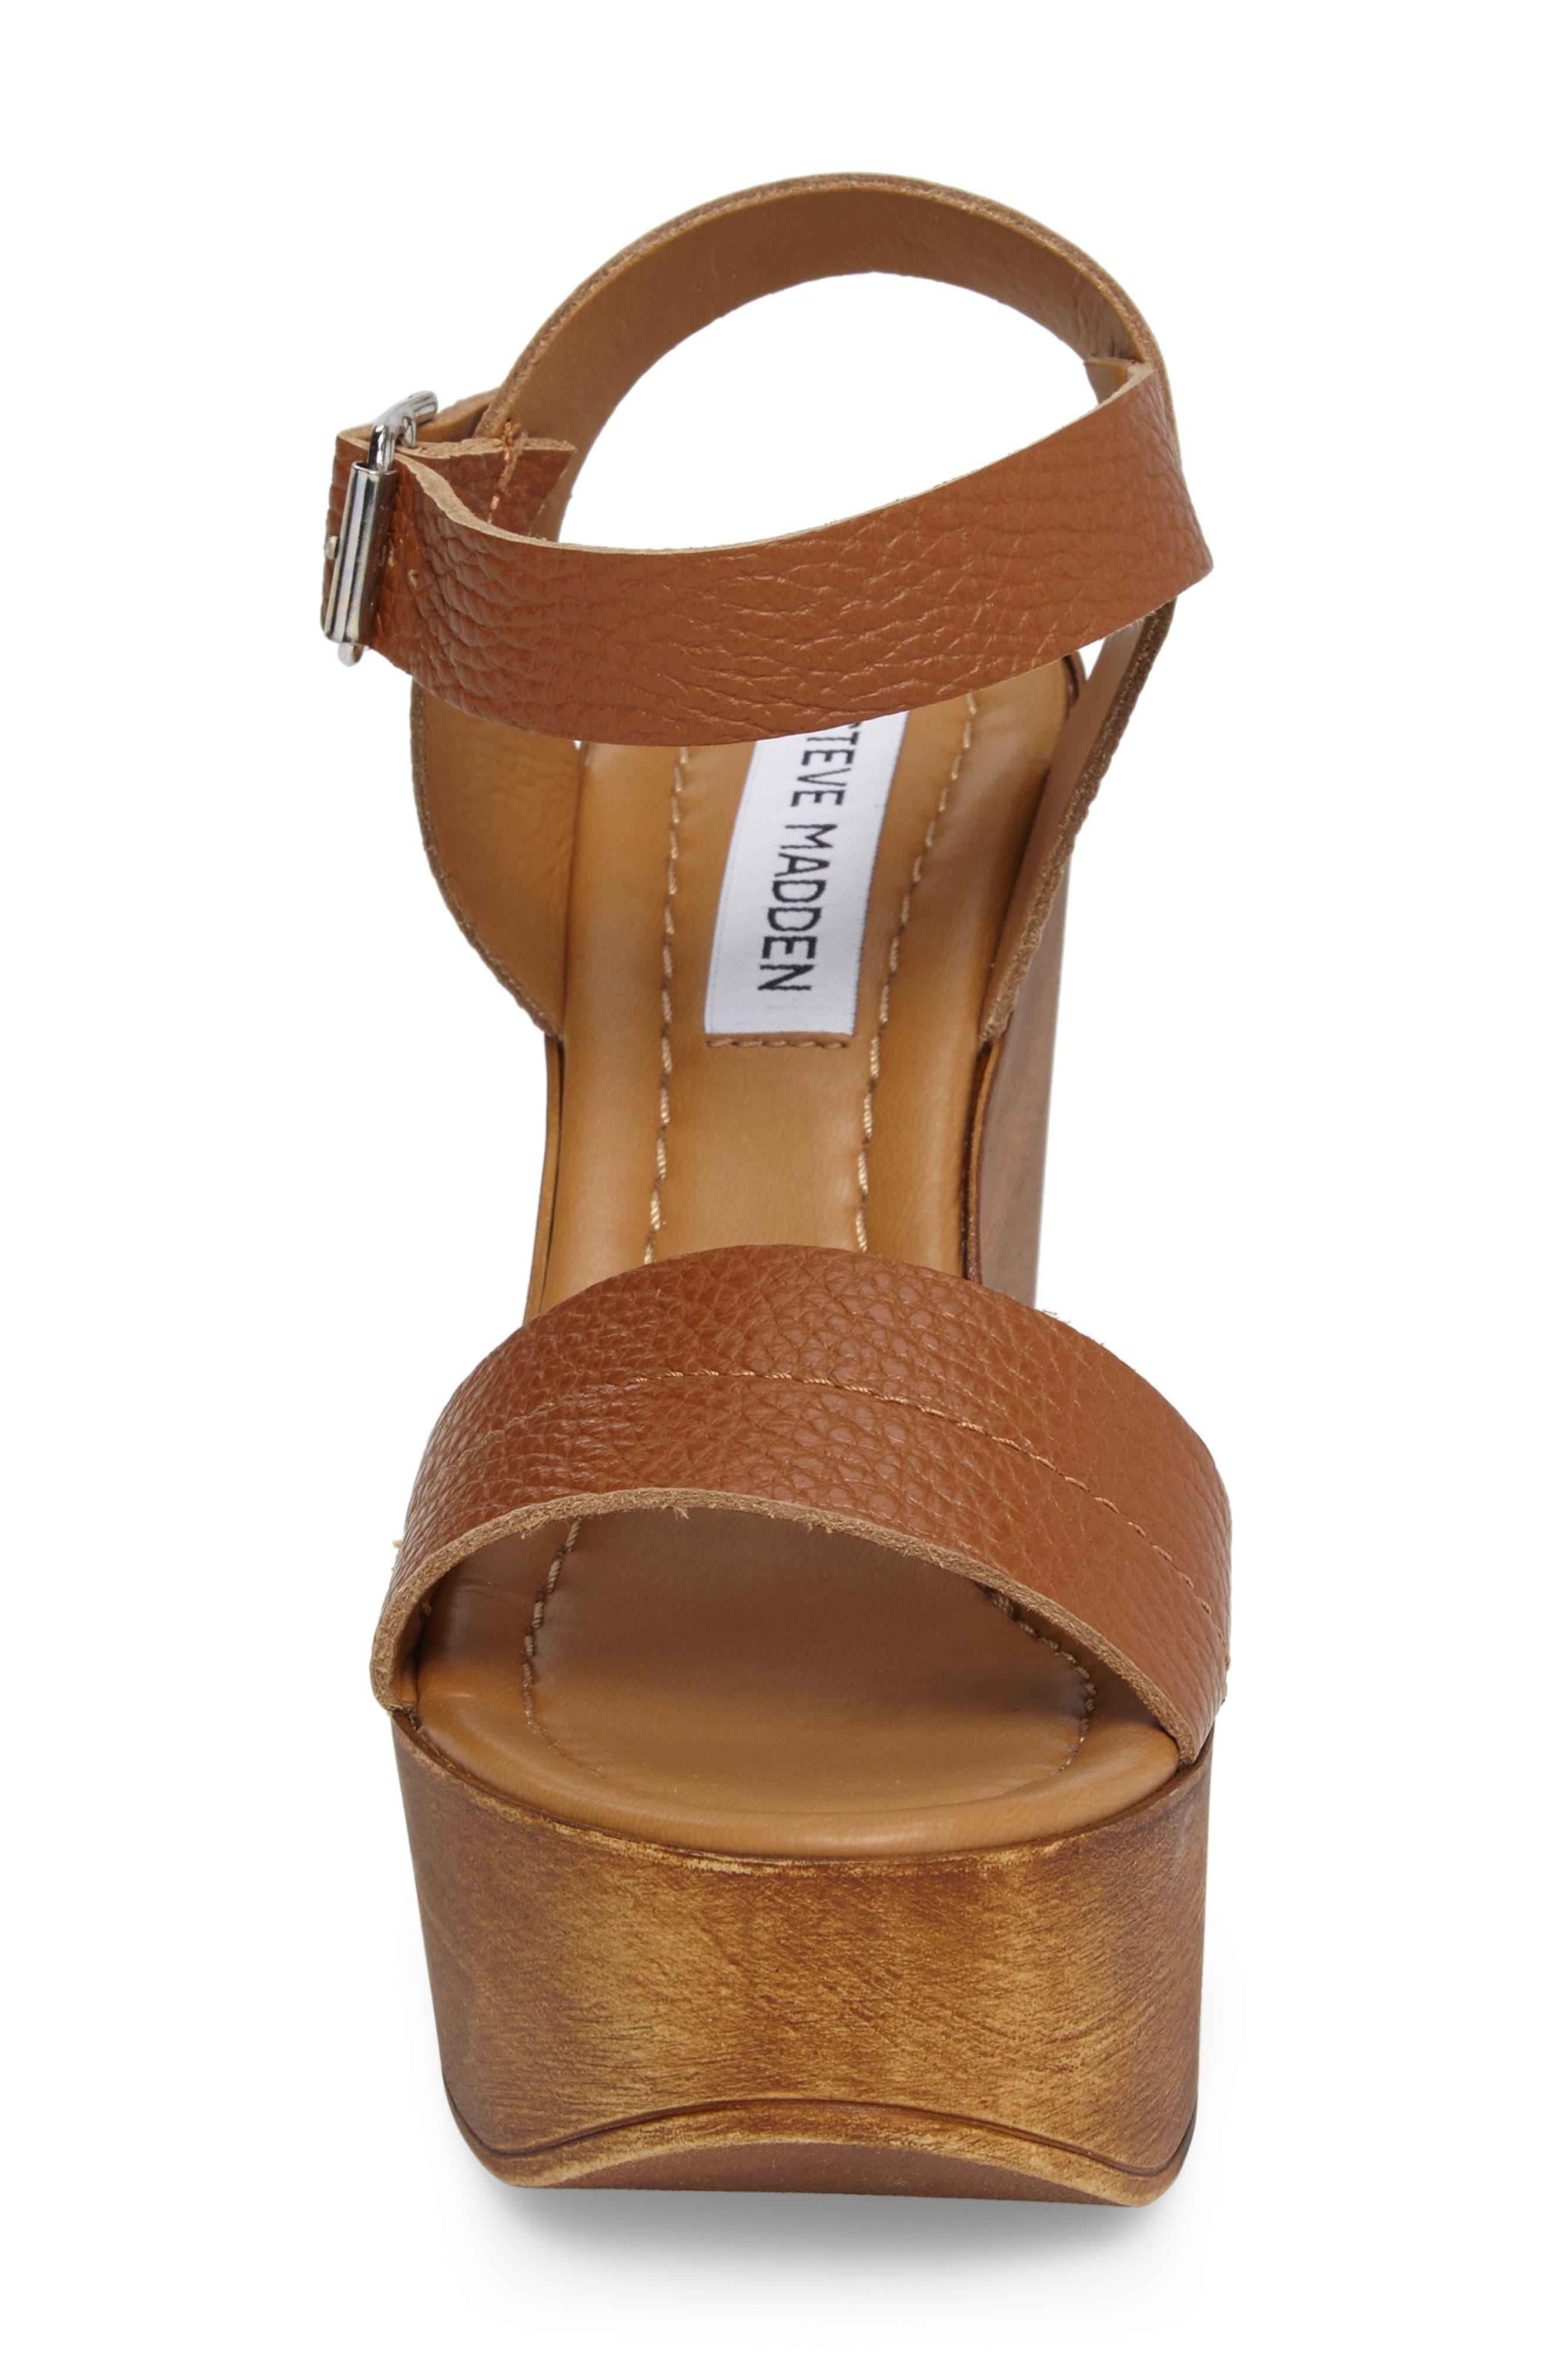 Belma Wedge Sandal,                             Alternate thumbnail 3, color,                             Tan Leather